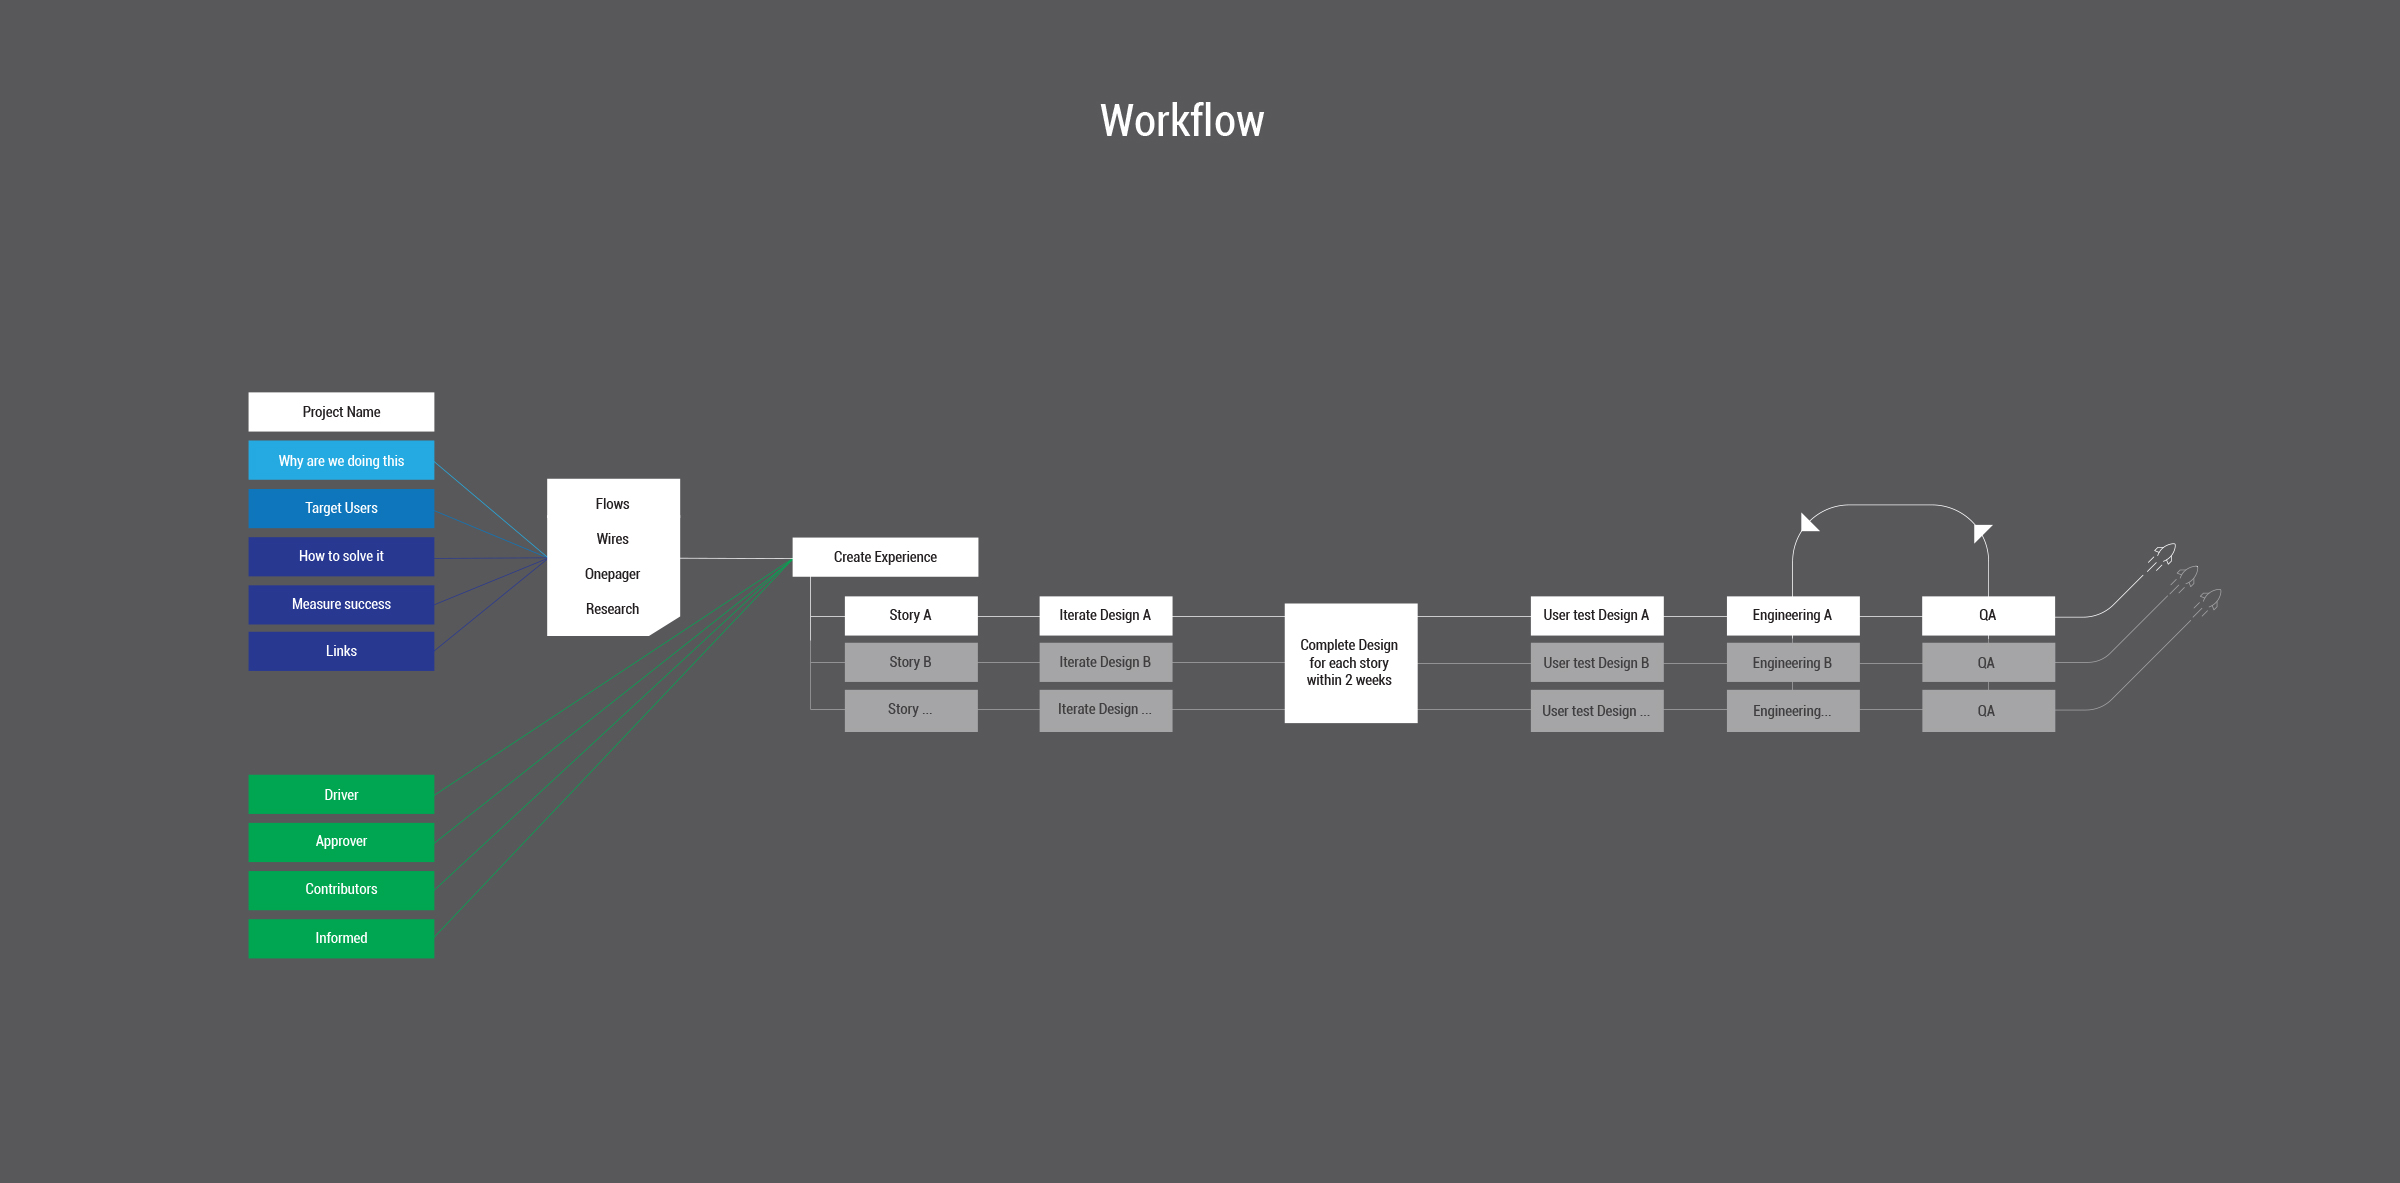 High level workflow